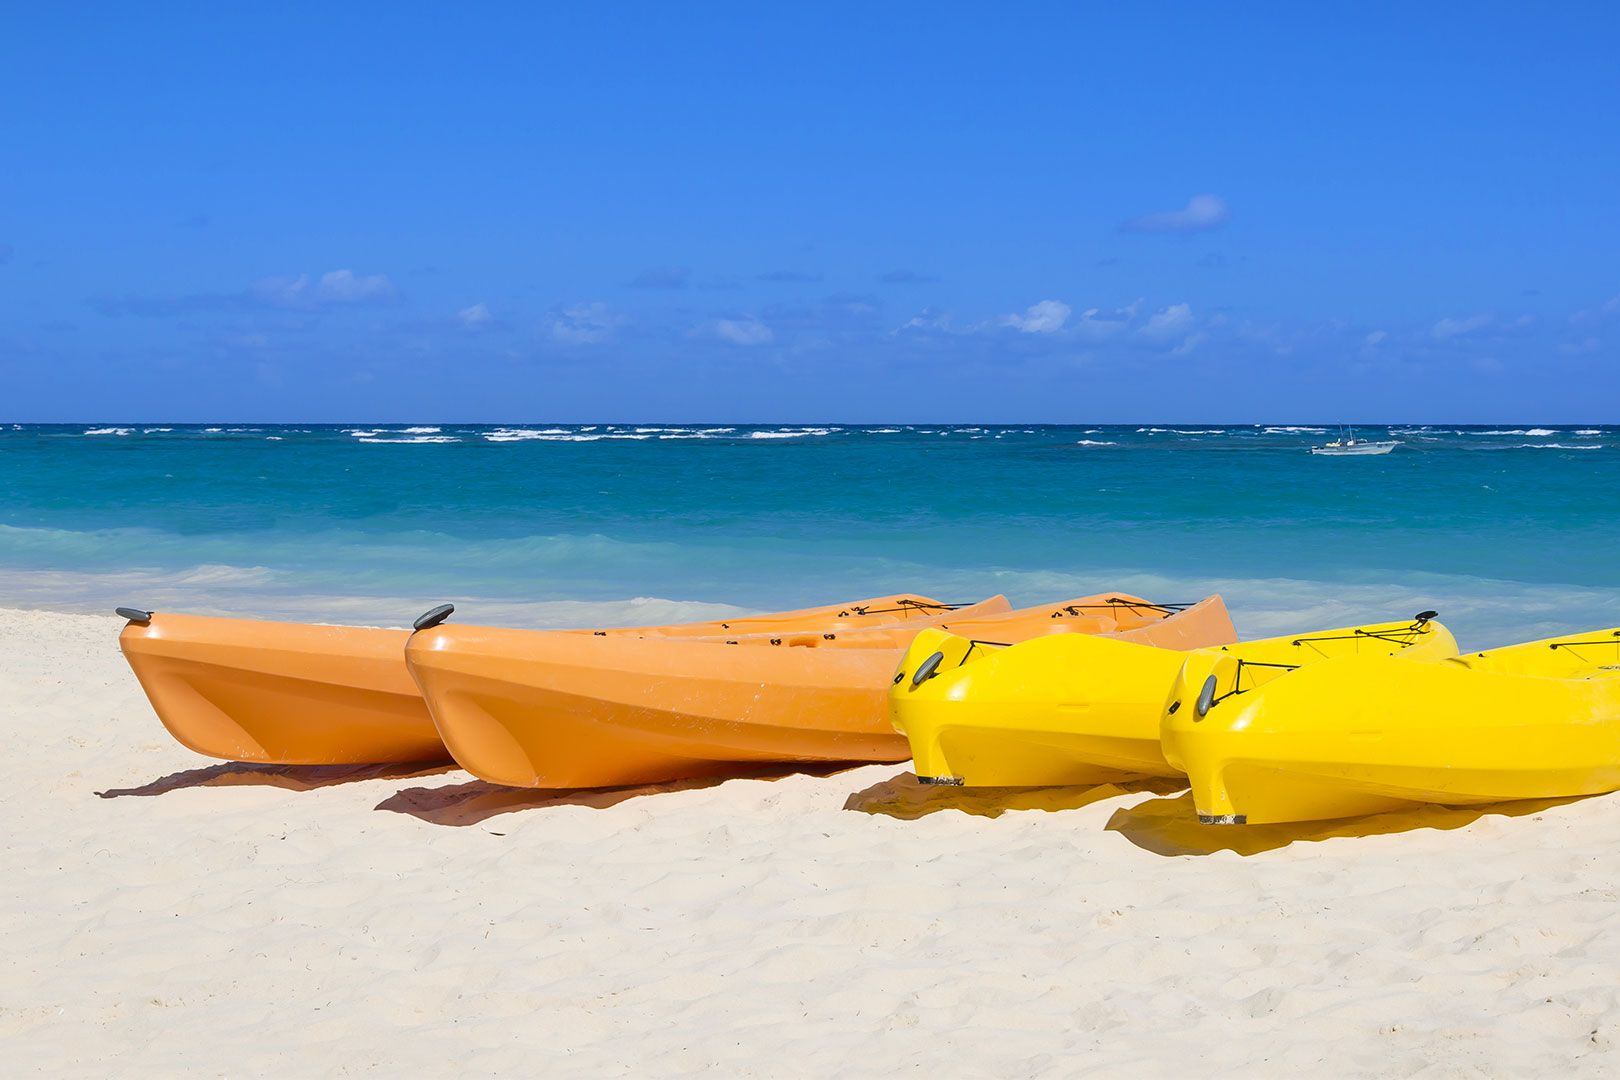 Oferta de weekend  - Sejur charter plaja Punta Cana, 9 zile - 29 octombrie 2021